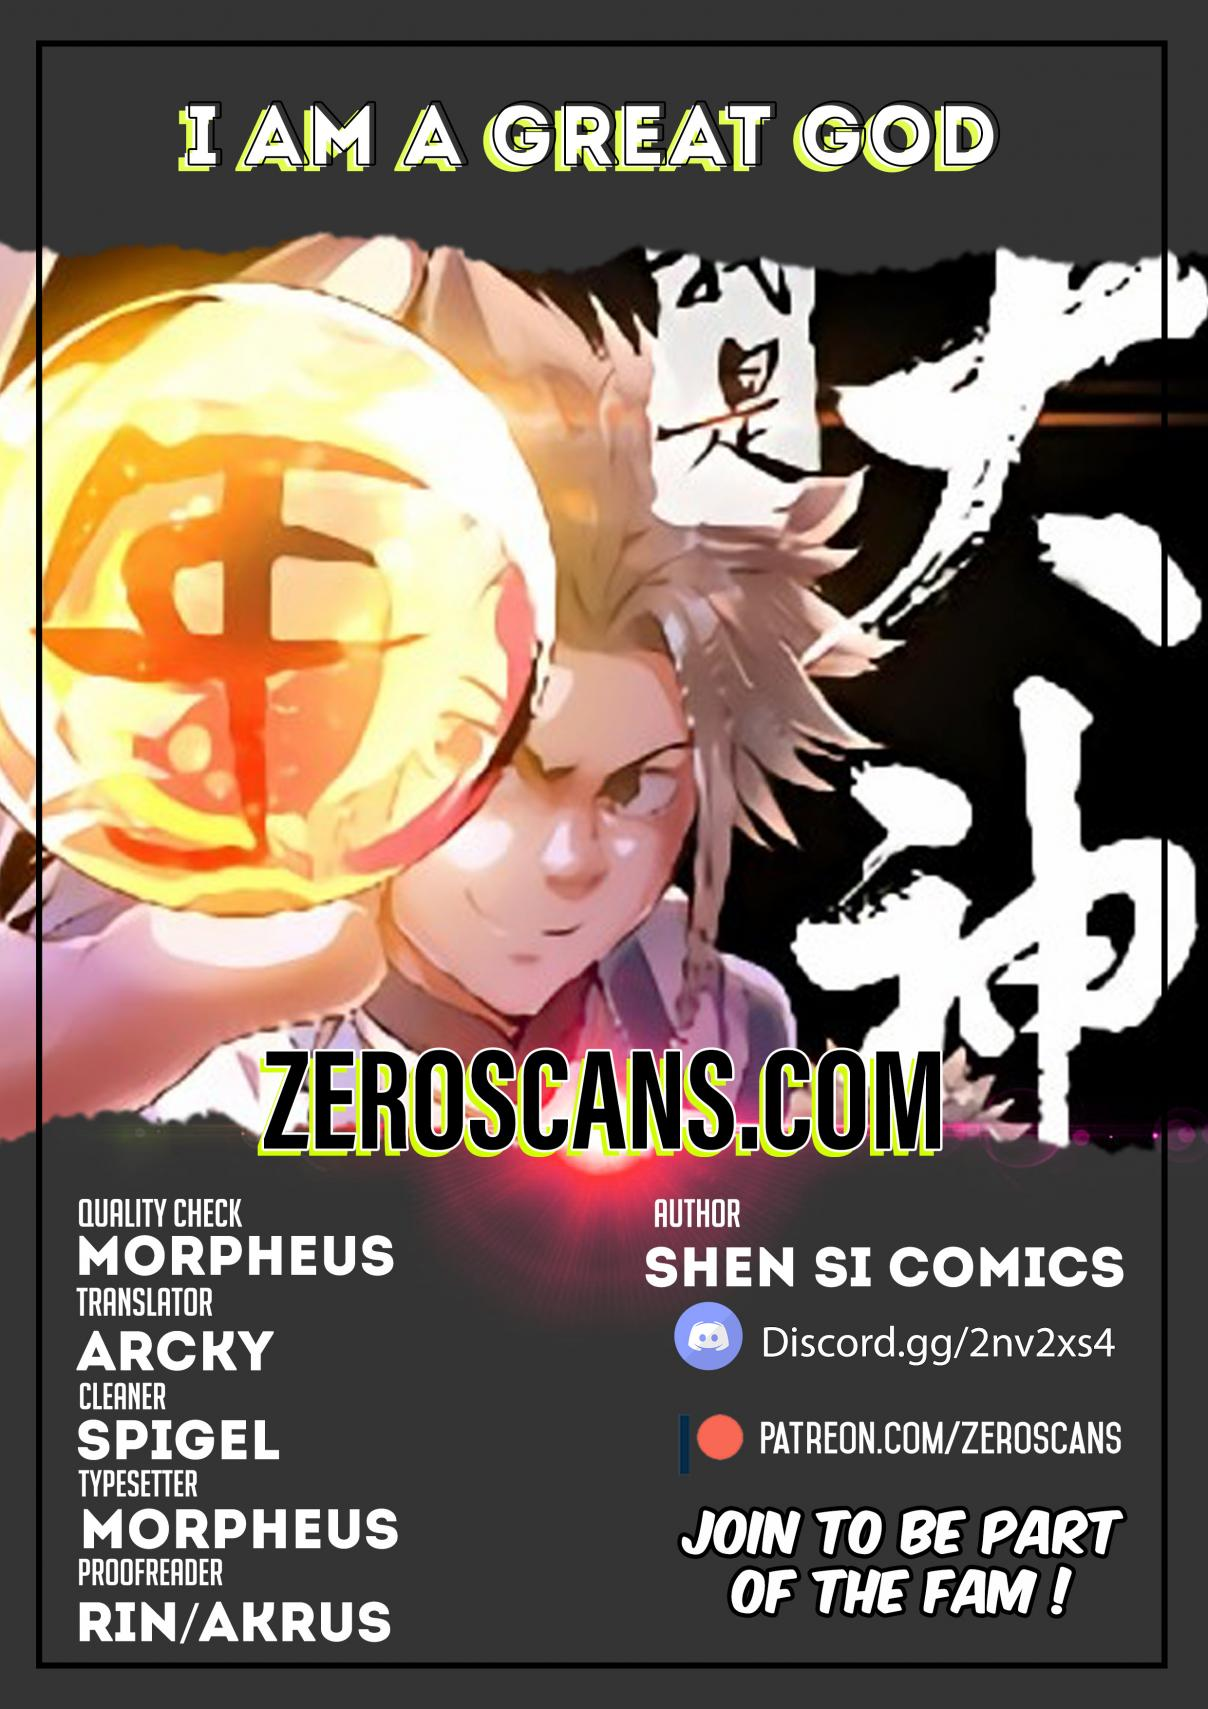 https://im.nineanime.com/comics/pic9/4/21124/512600/3531d0b9e7d83caaef7ecf9ec9b363f2.jpg Page 1